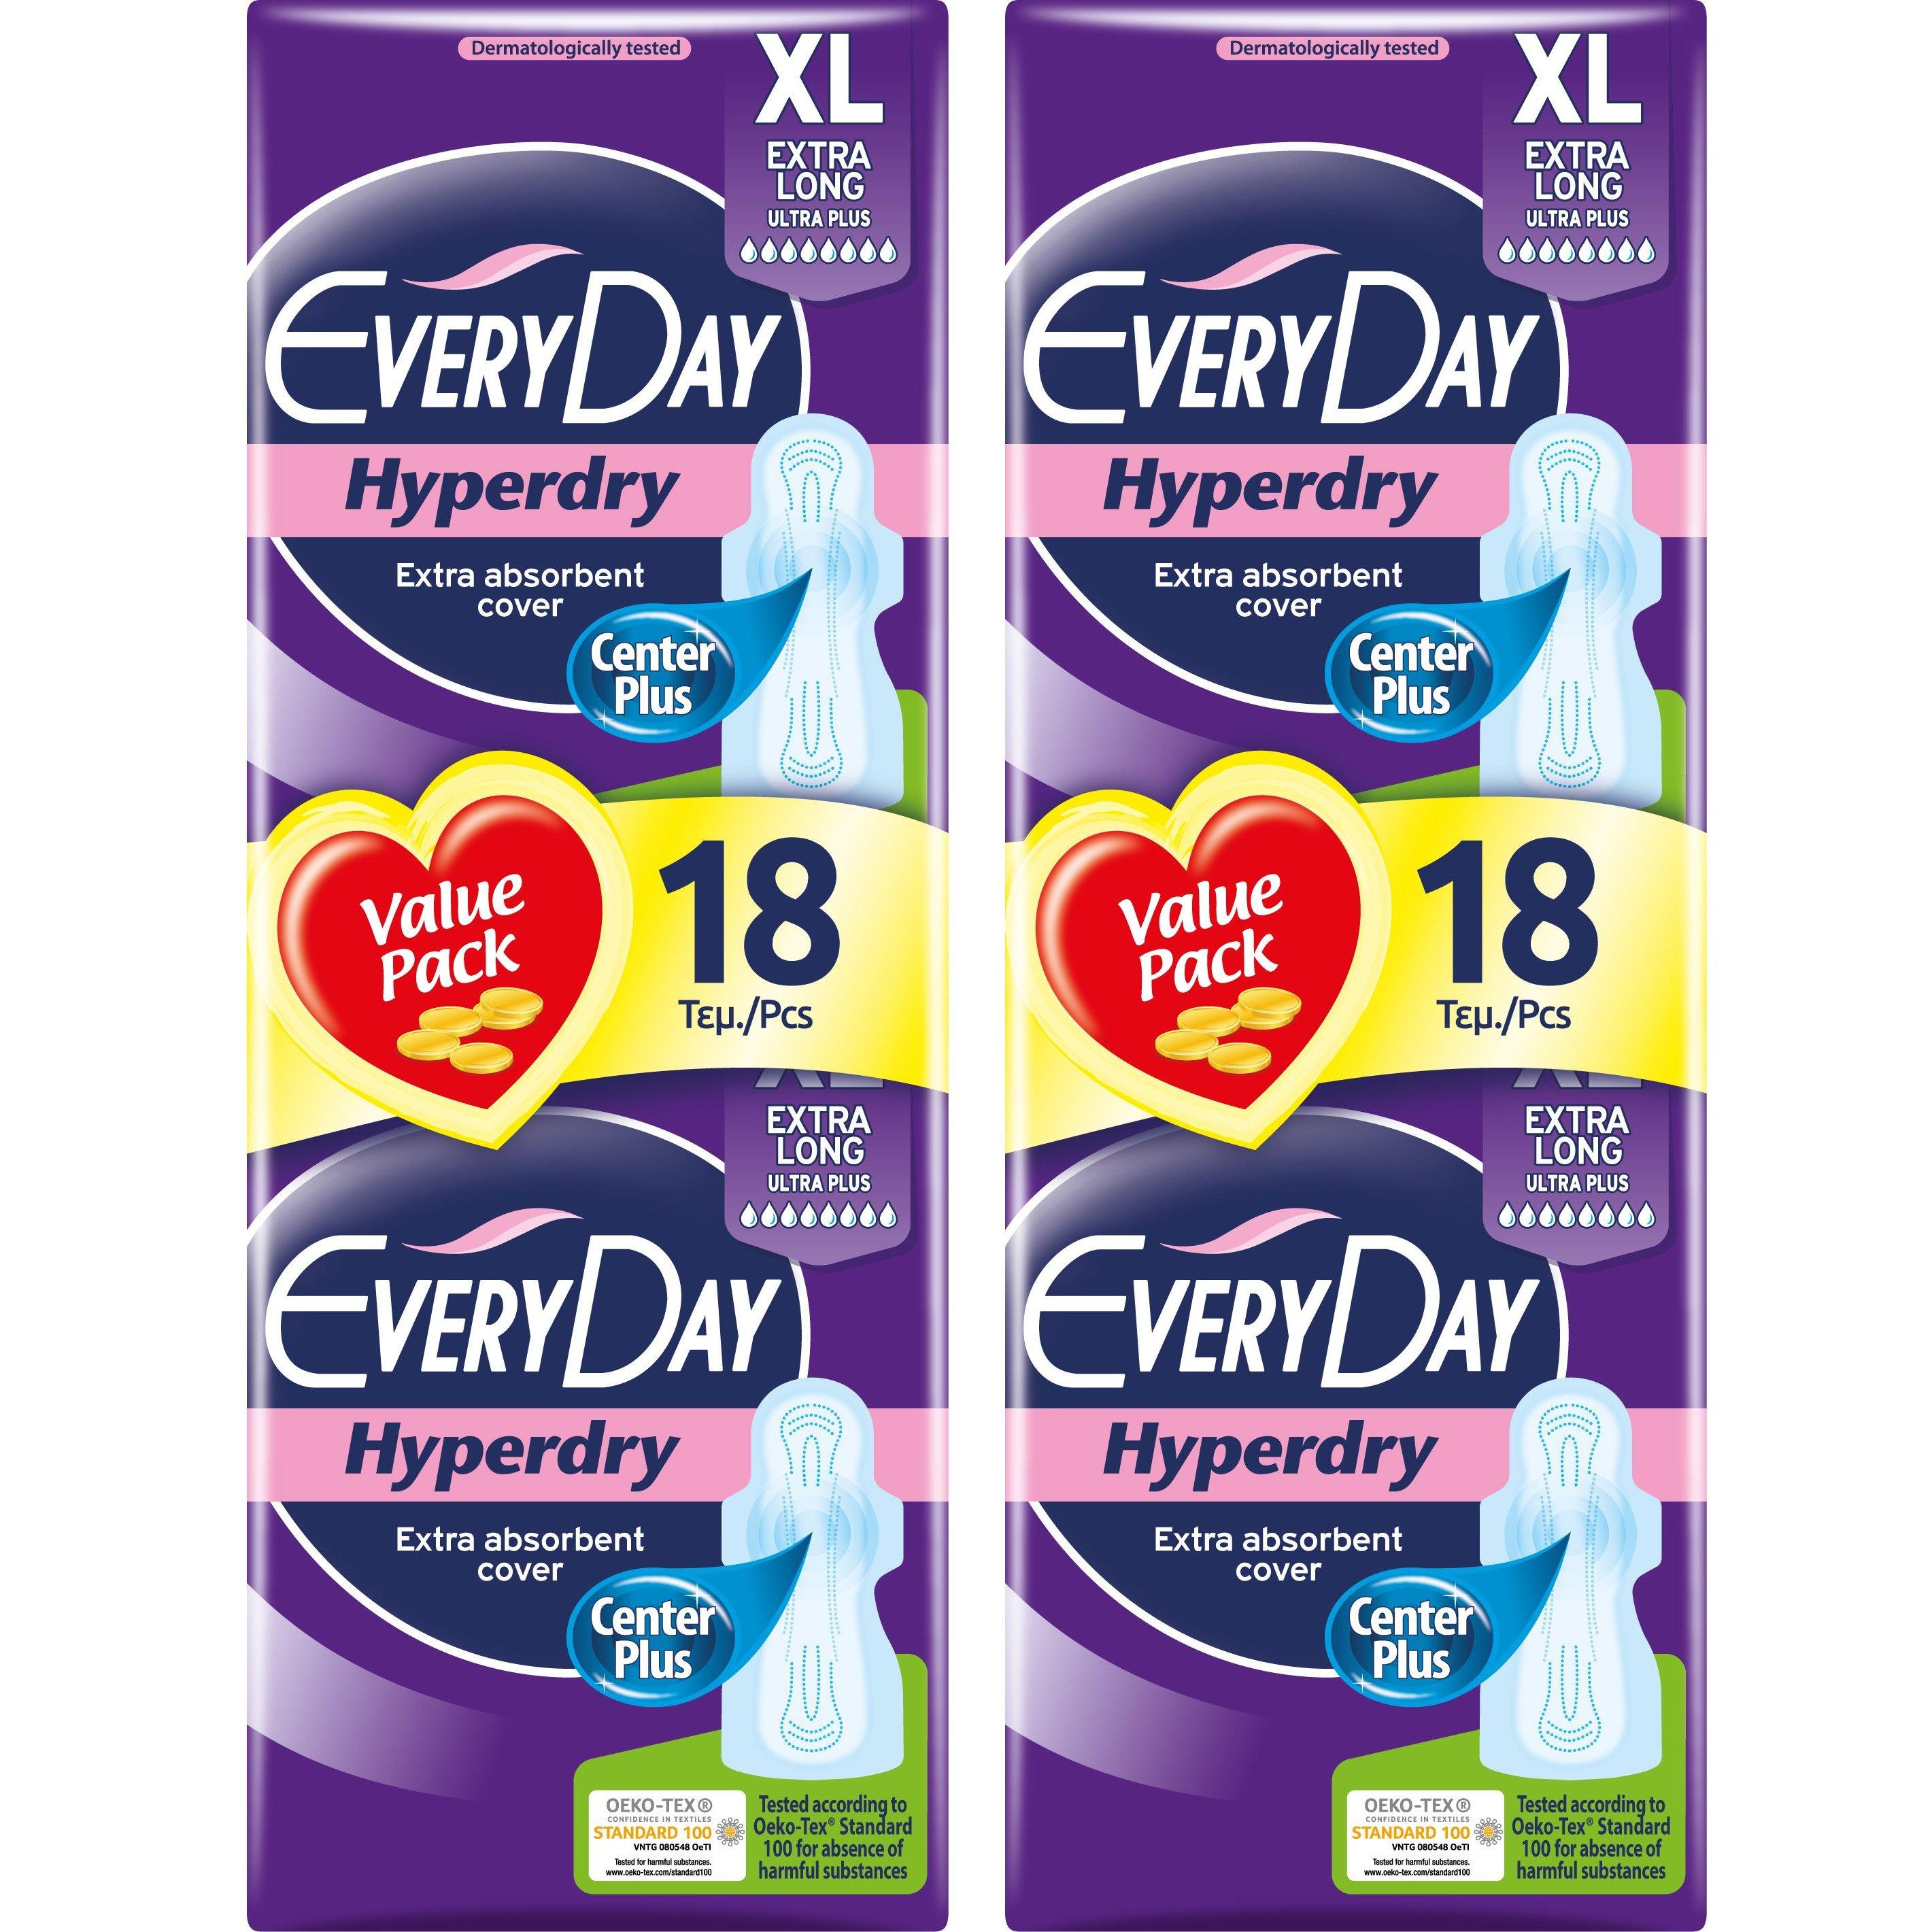 Every Day Πακέτο Προσφοράς Hyperdry Extra Long XL Value Pack Σερβιέτες Ιδανικές για Μεγάλη Ροή 2×18 Τεμάχια 1+1 Δώρο